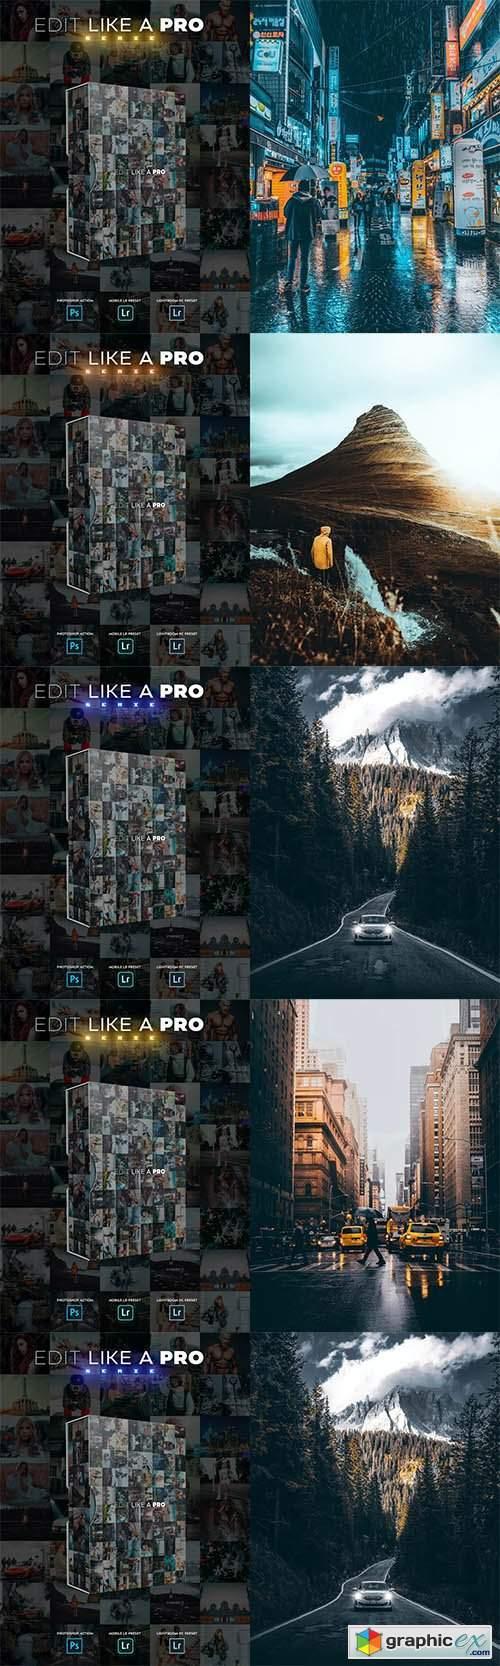 Edit Like A PRO 28-32th - Photoshop & Lightroom